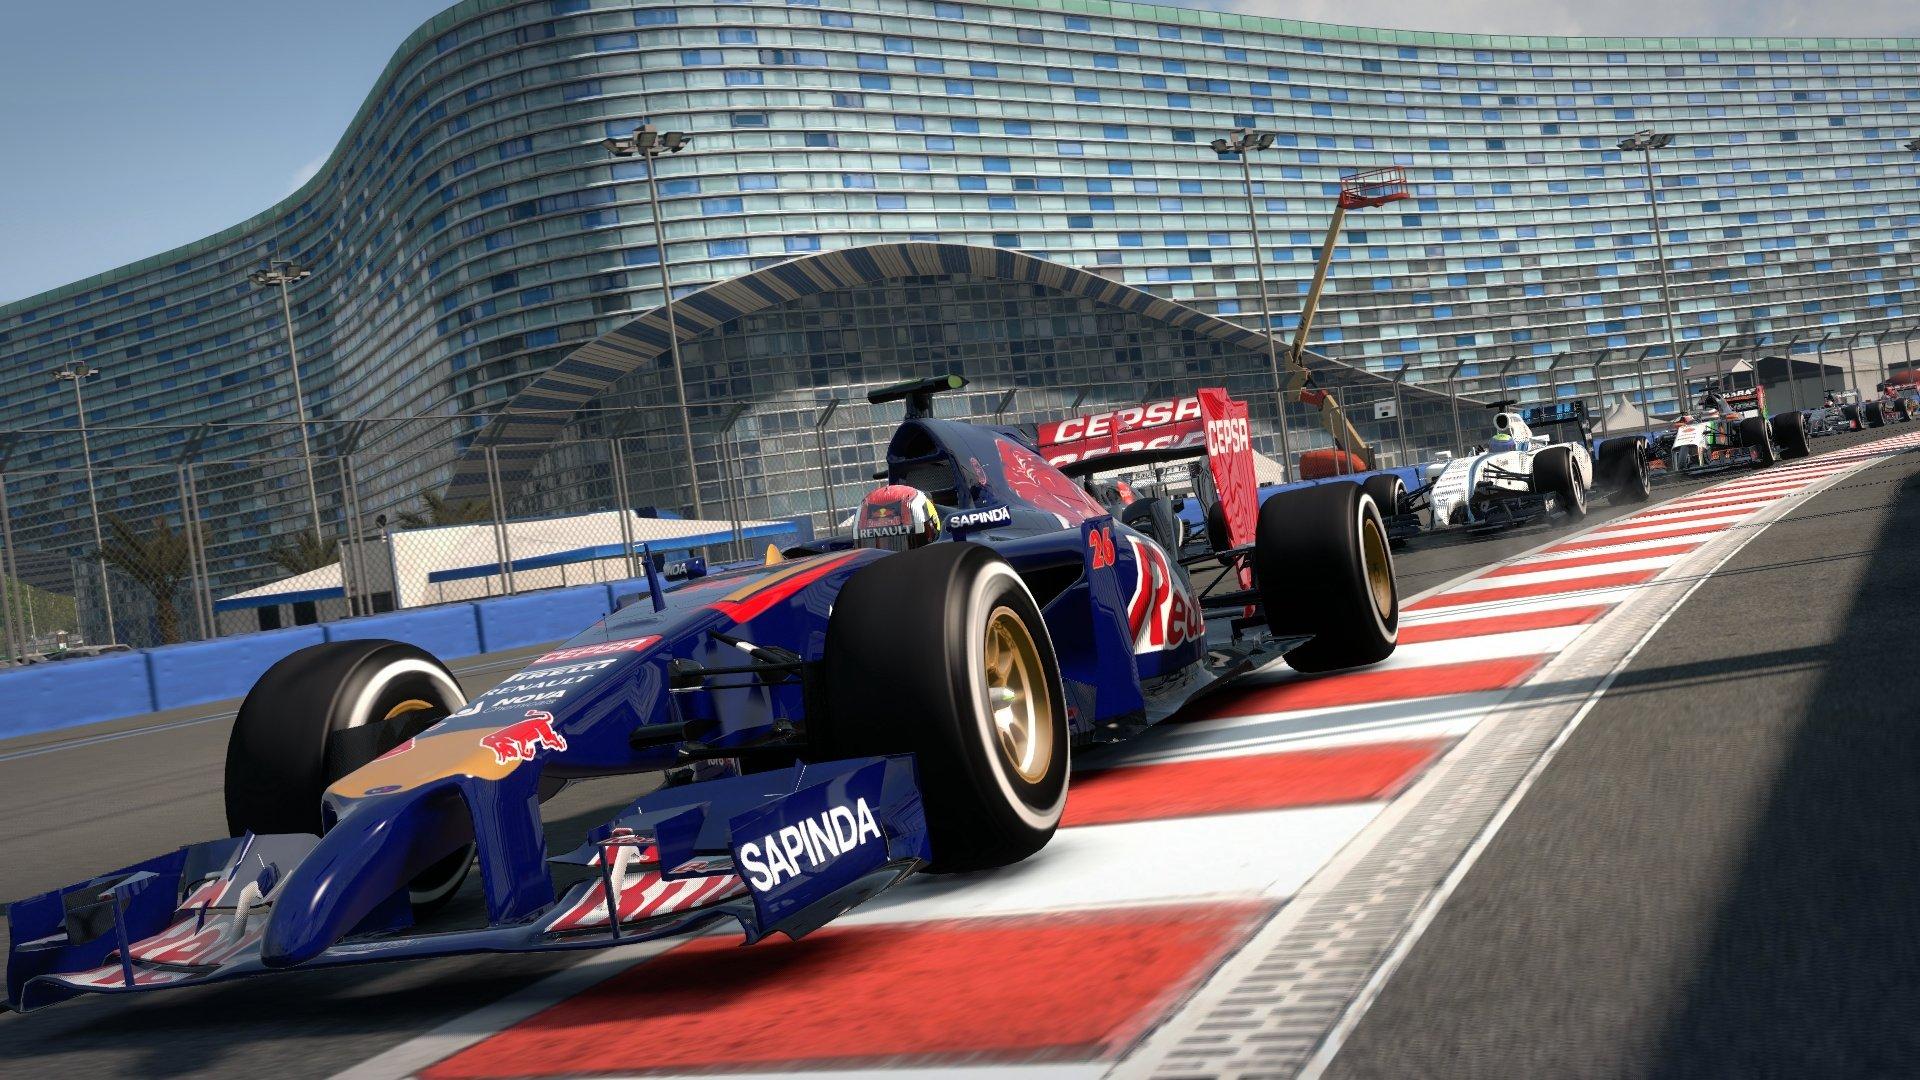 F1 2014 (Xbox 360) News, Reviews, Screenshots, Trailers